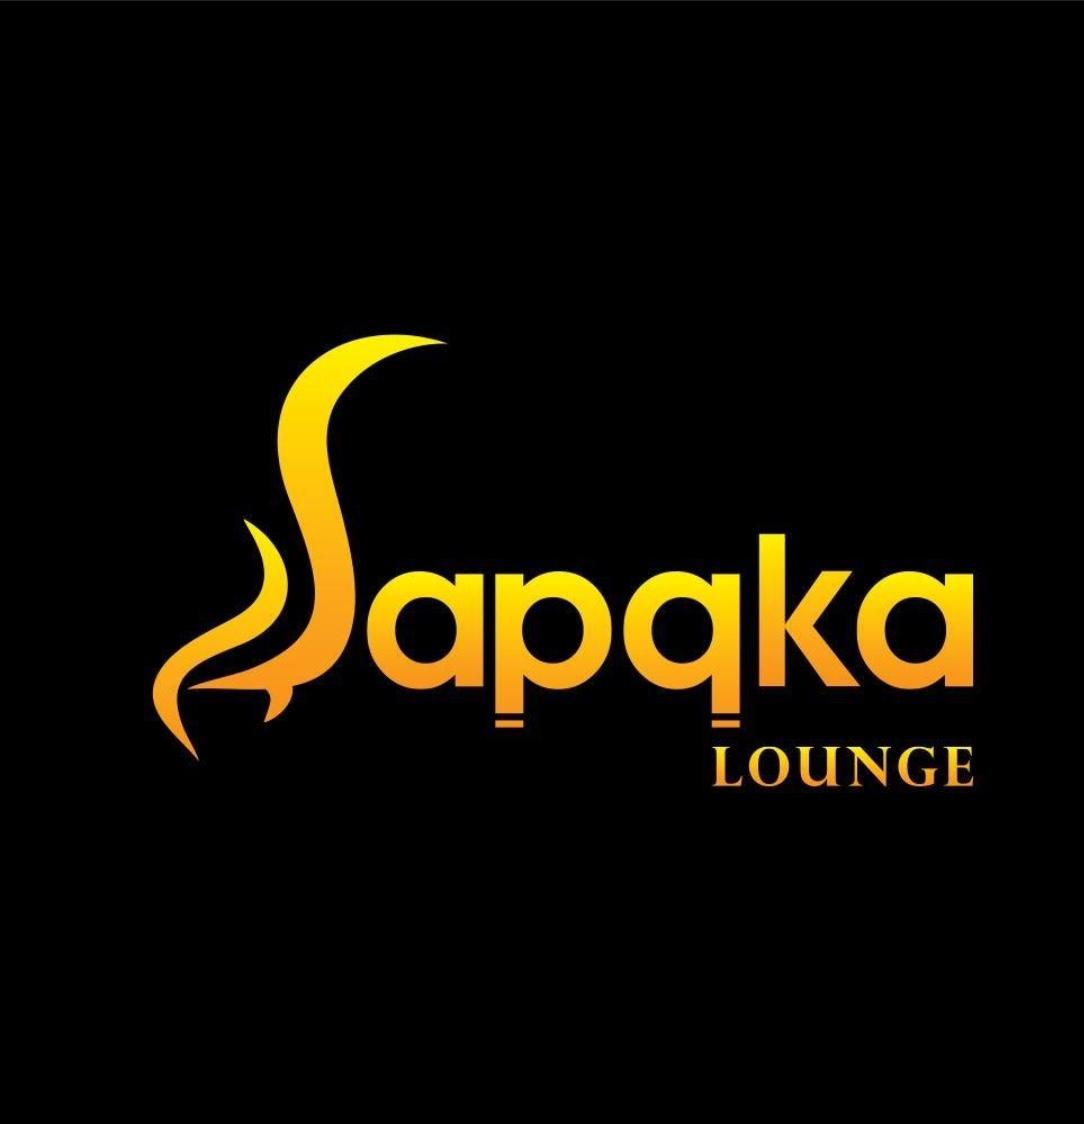 Şapqka Cafe Nargile Lounge